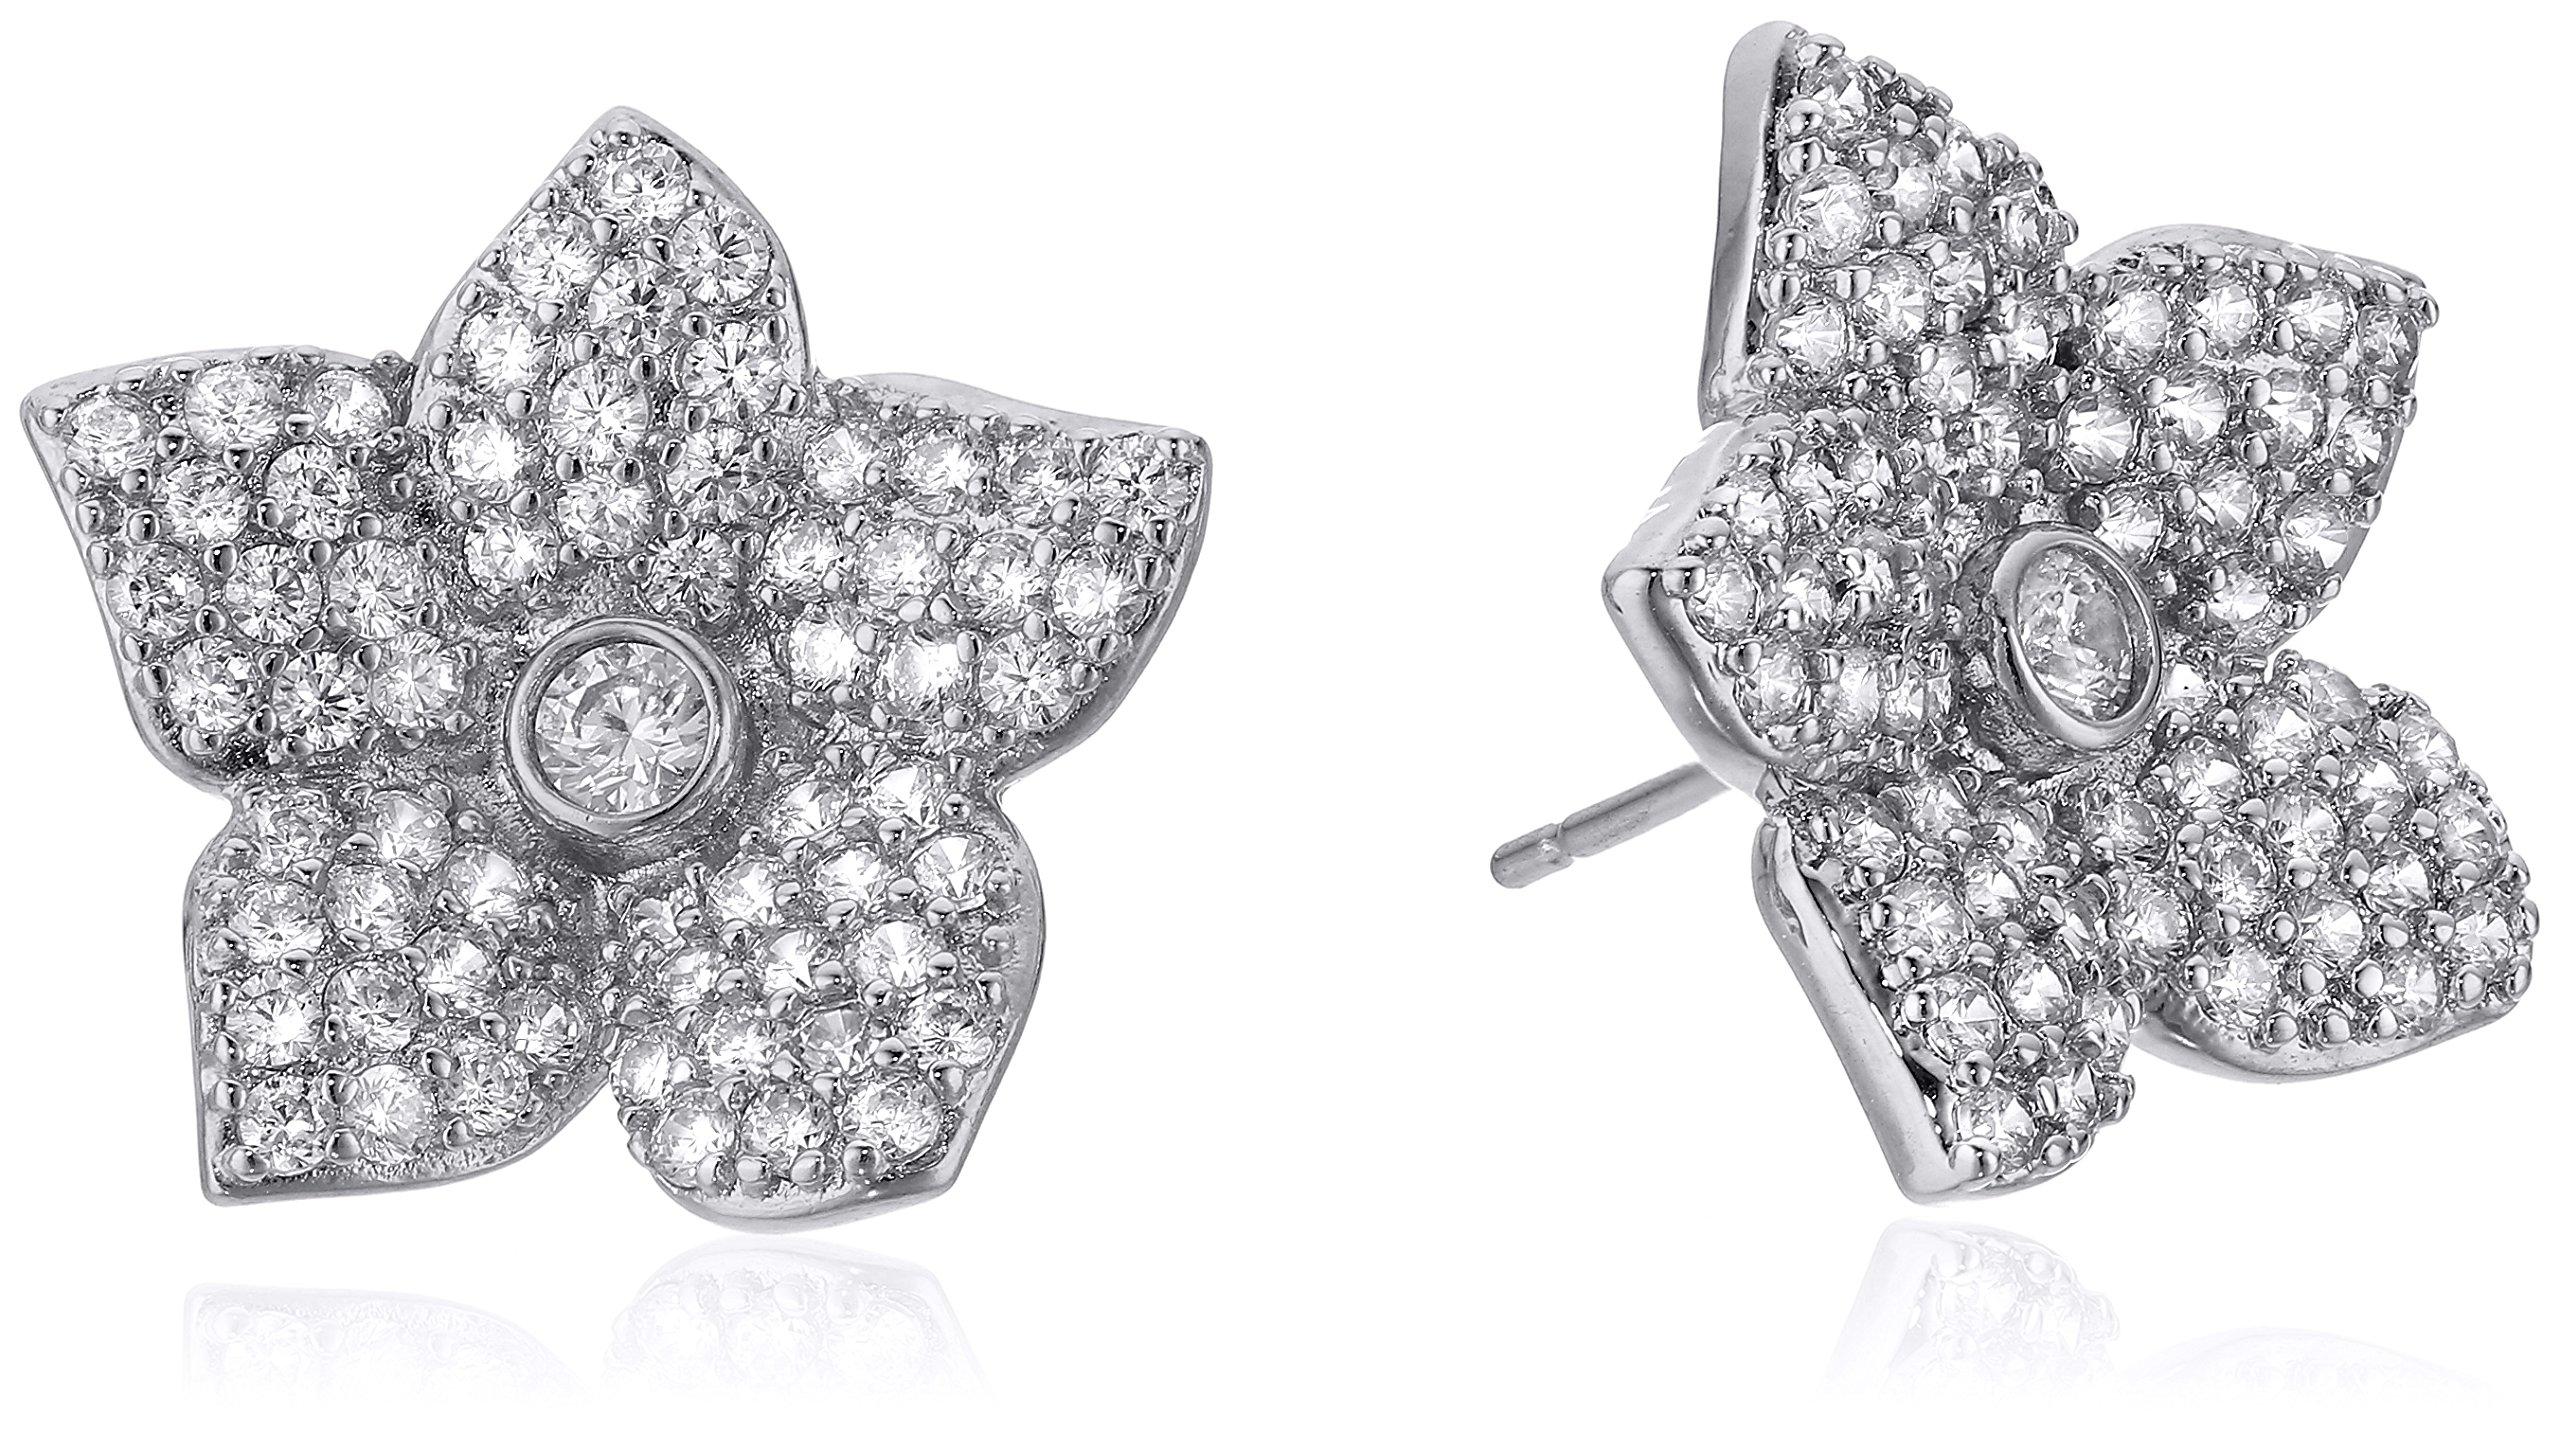 kate spade new york''Pave Bloom Studs'' Blooming Pave Bloom Clear/Silver Stud Earrings